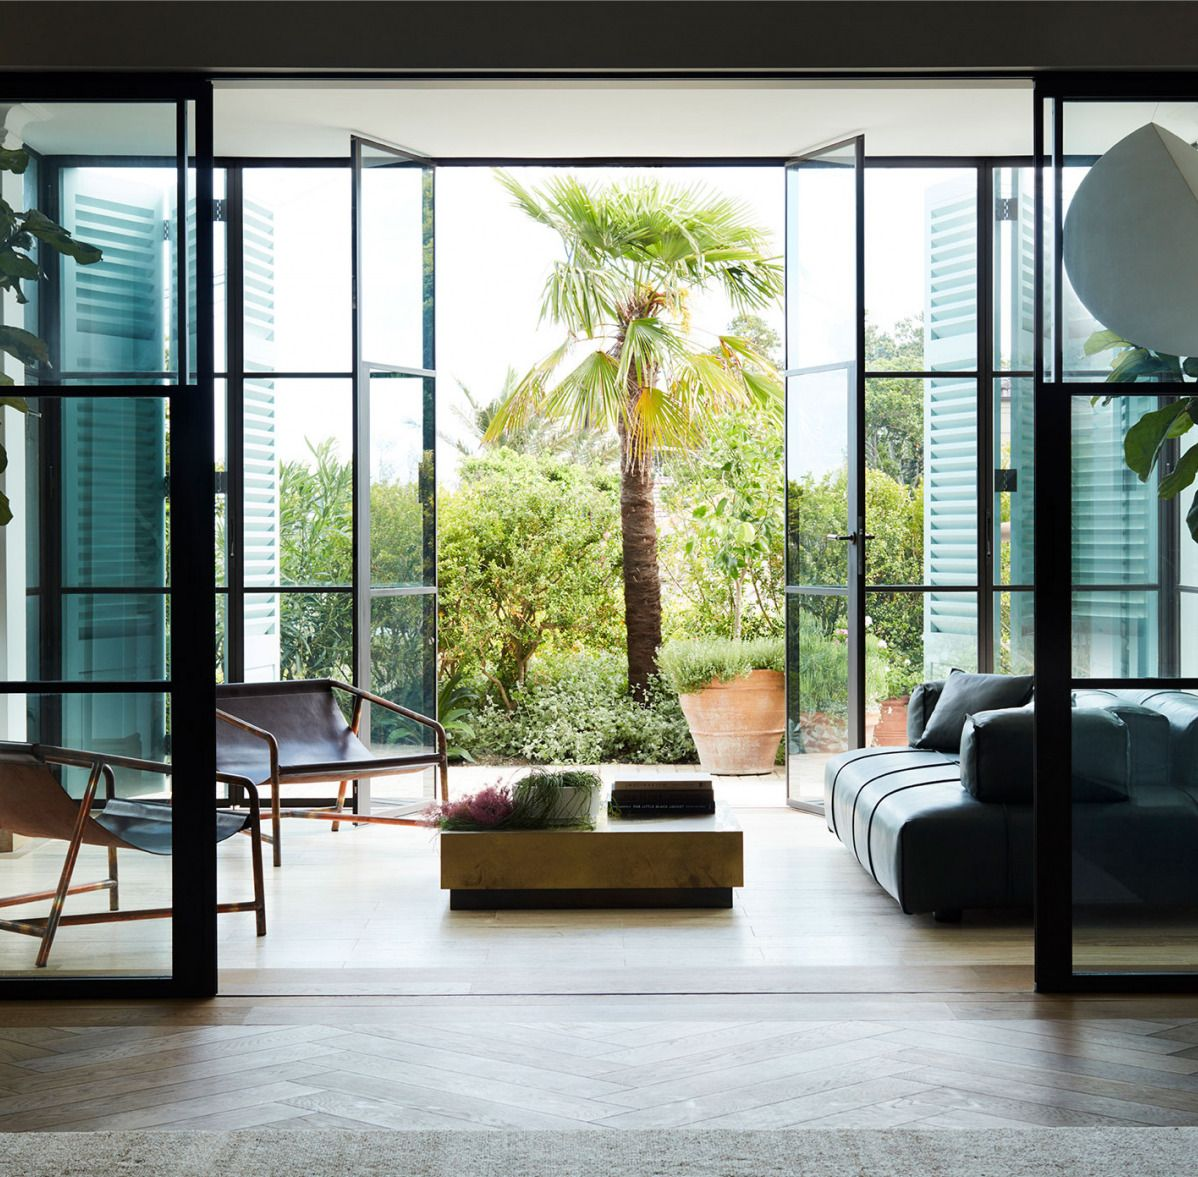 Luigi Rosselli Architects & Alwill Interiors